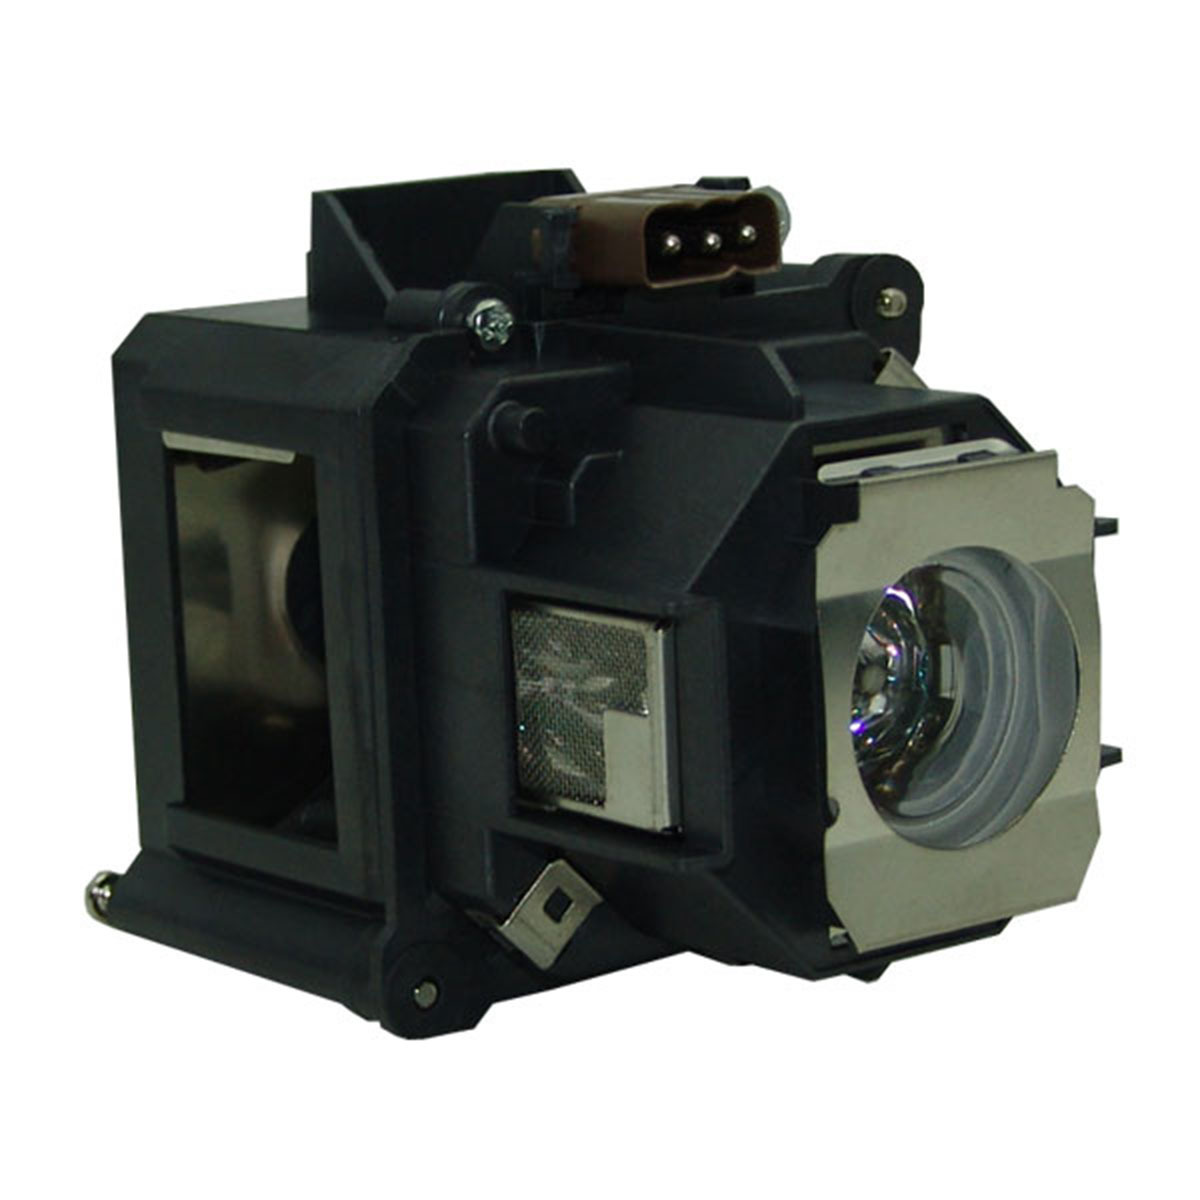 Epson ELPLP46 Compatible Projector Lamp Module - $45.00